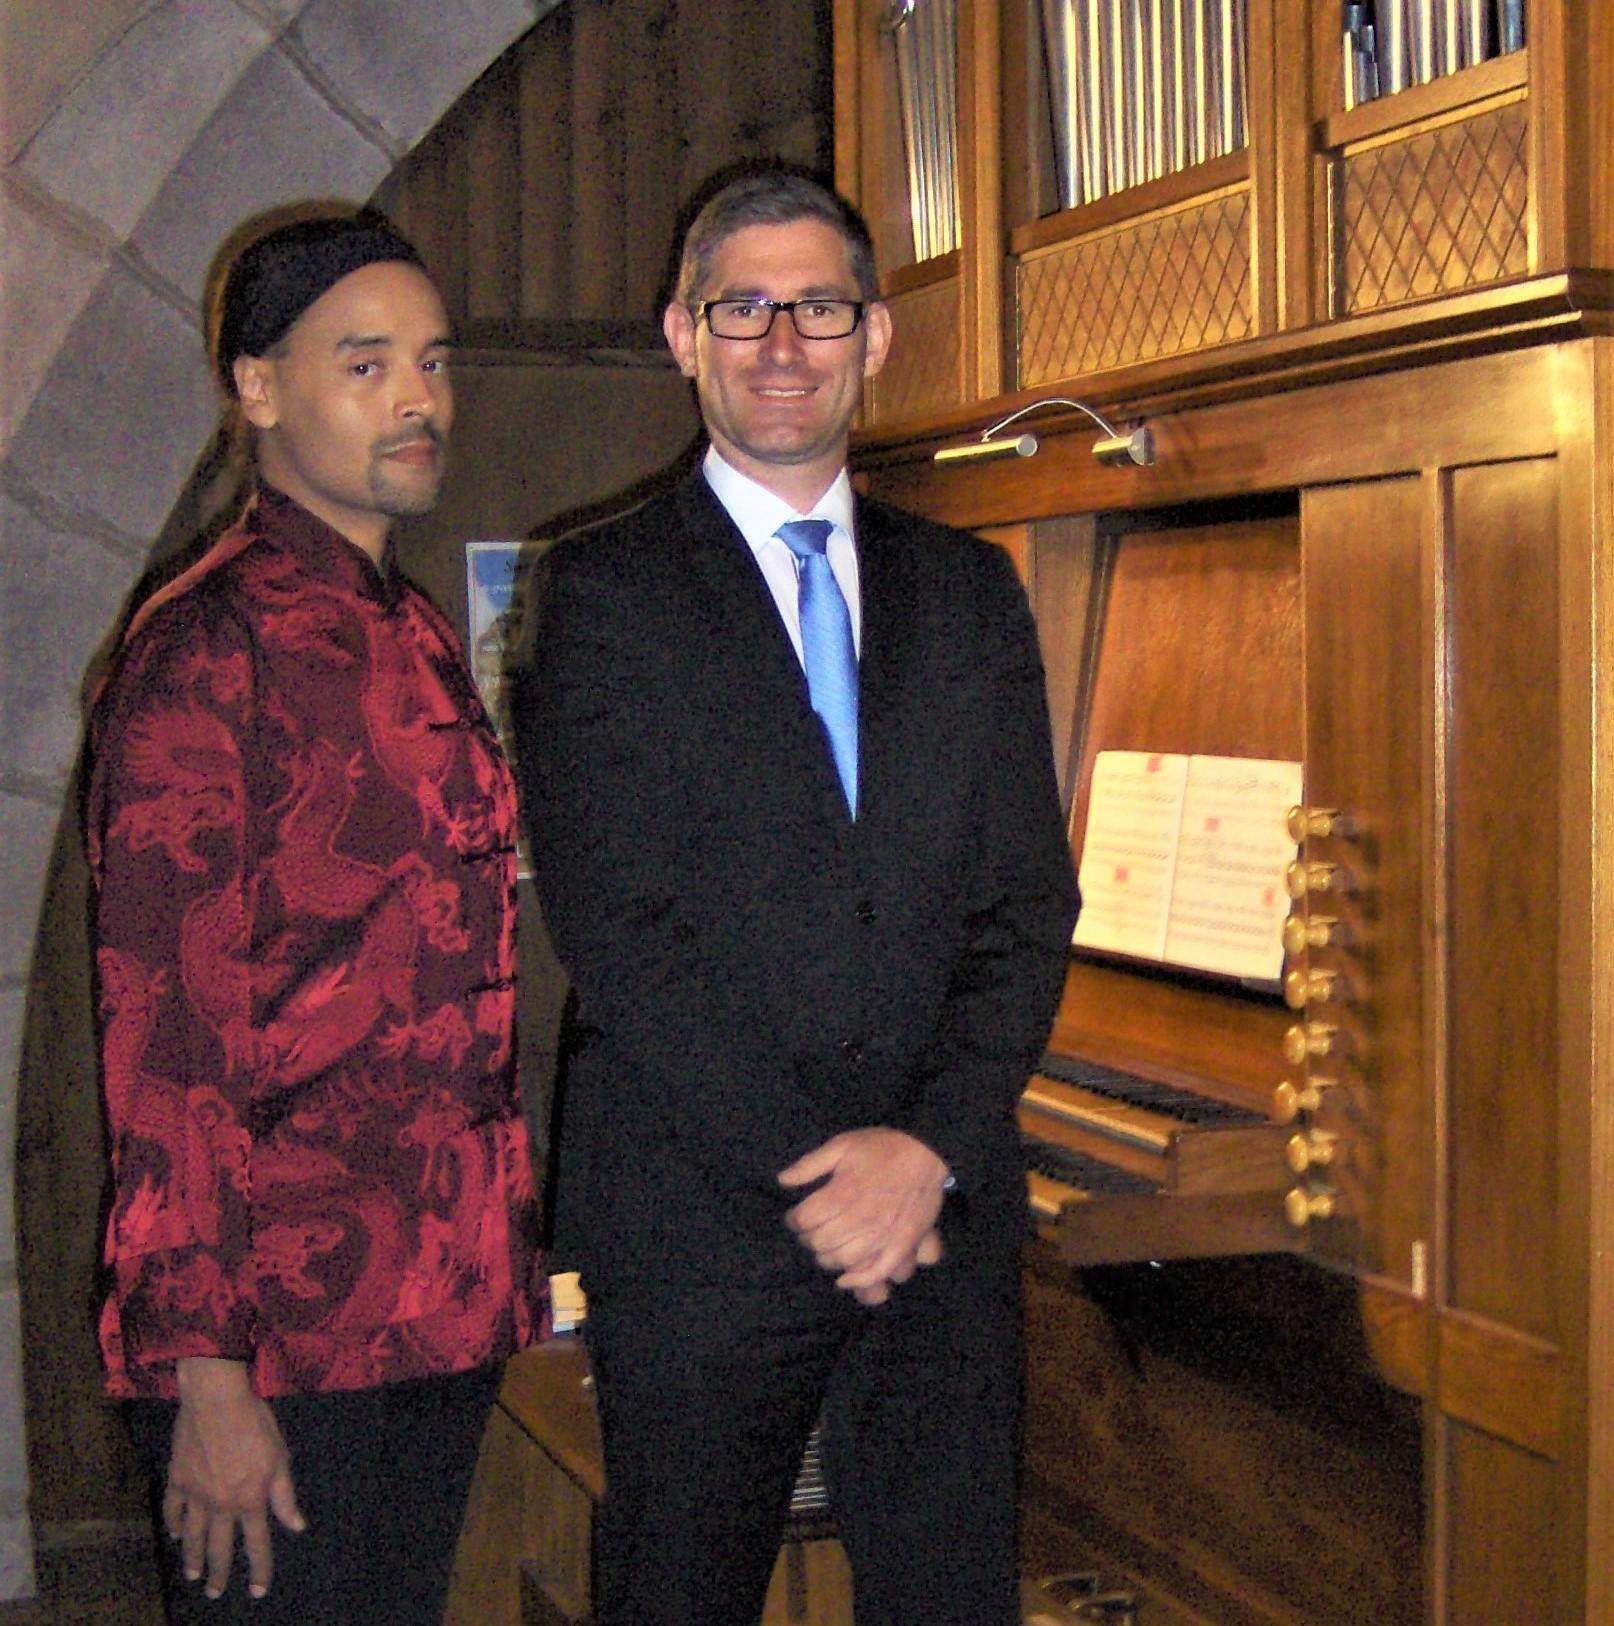 Mai 2018: Sopraniste et orgue